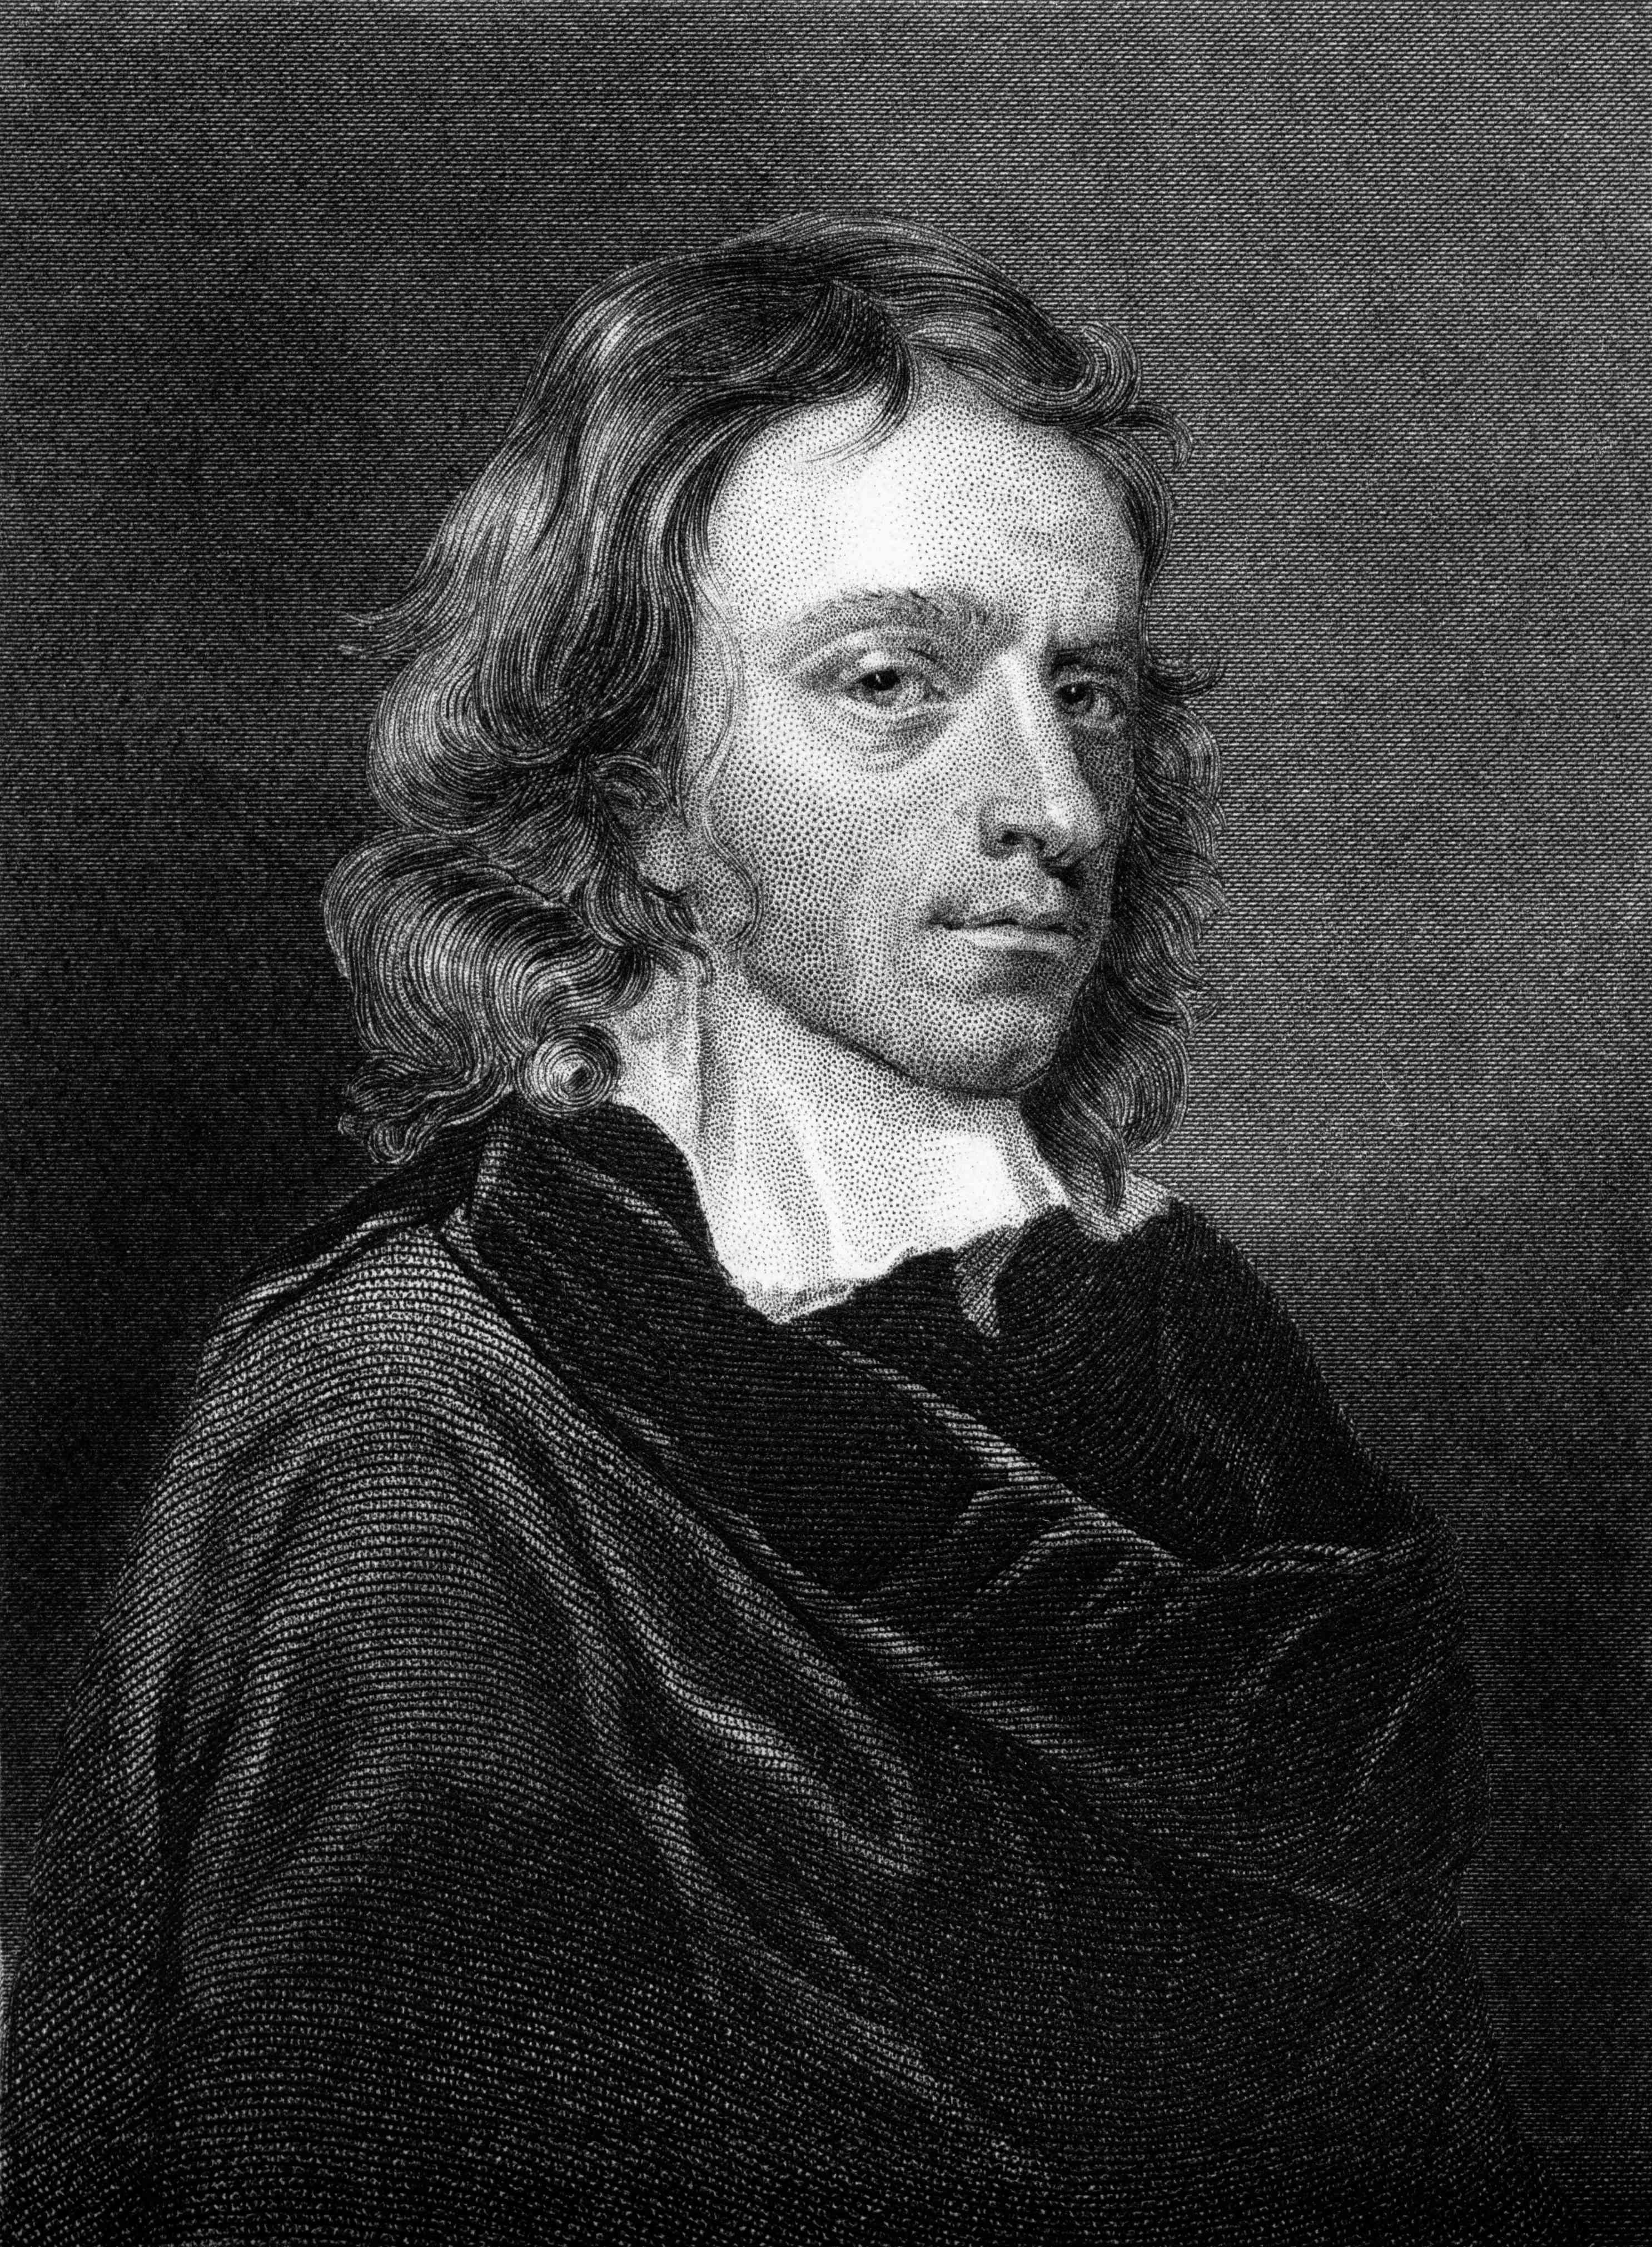 Engraving of John Milton in black and white